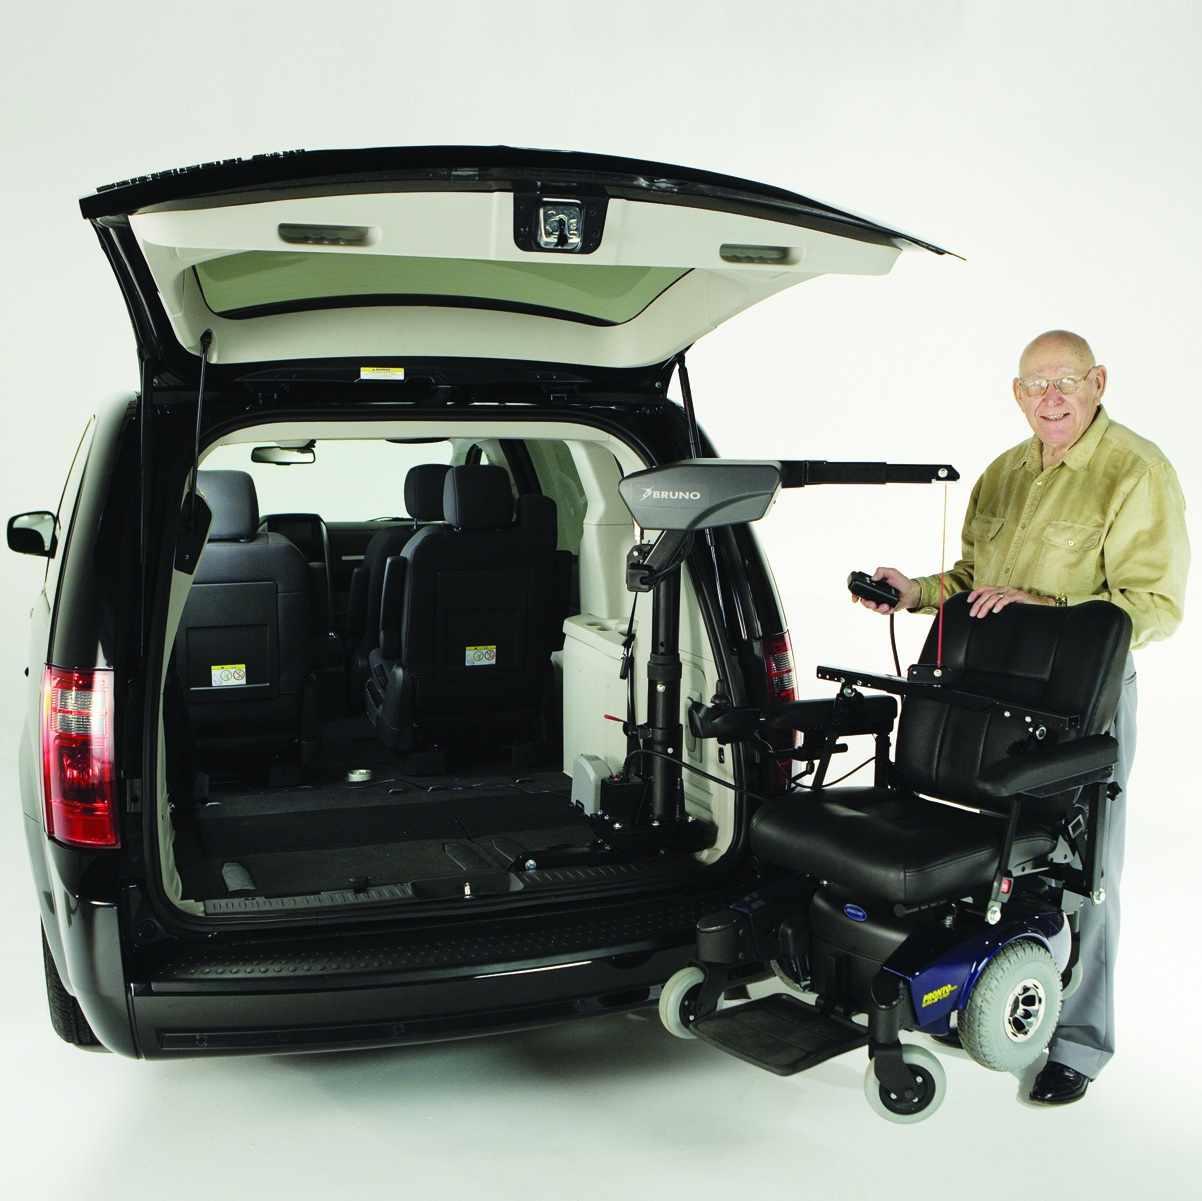 Bruno VSL-570 Big Lifter™ vehicle lift